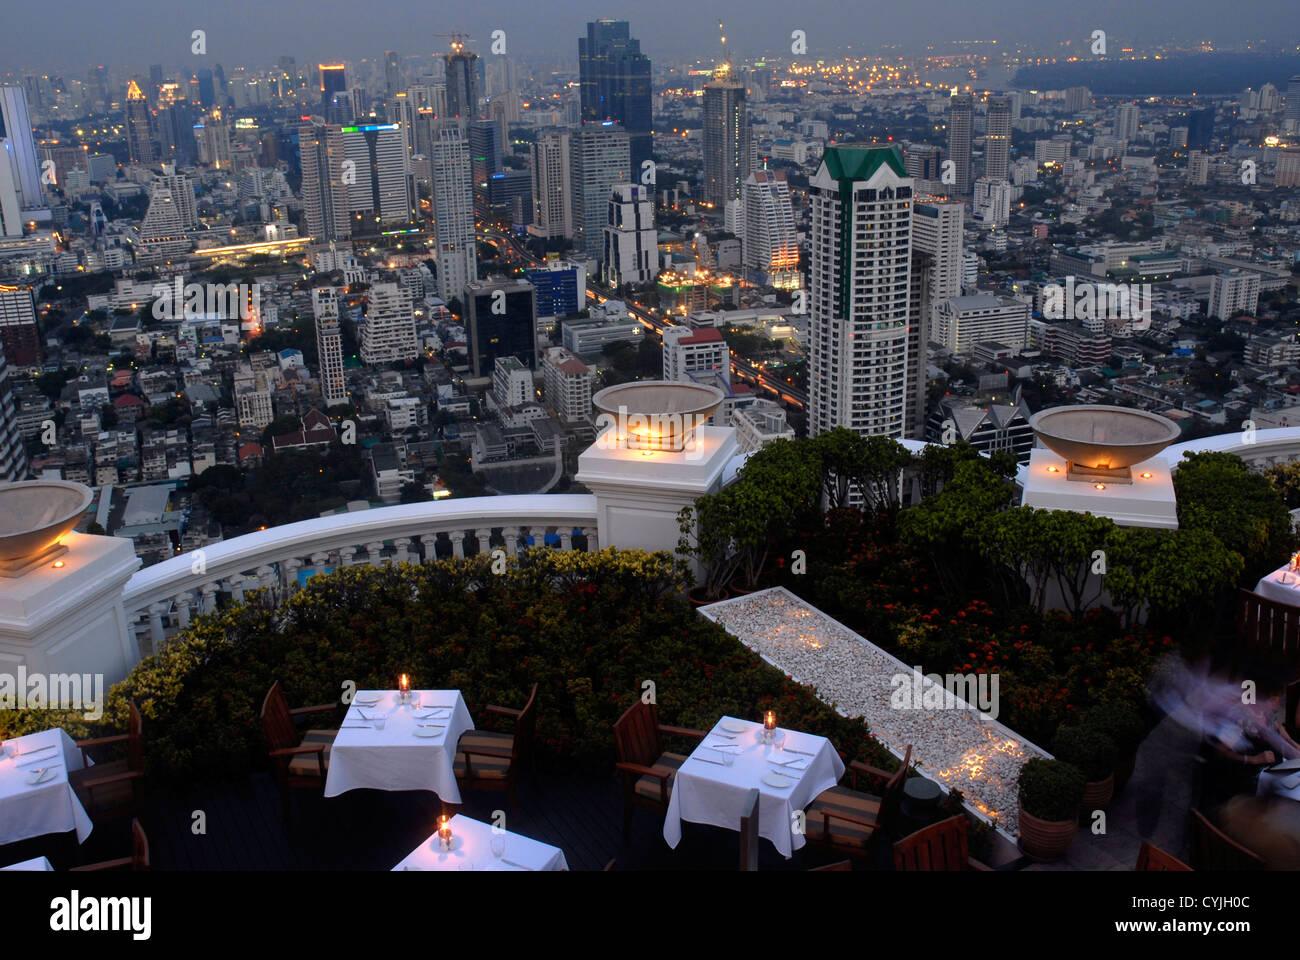 Restaurant, Sirocco, Dome,  State Tower. Bangkok, Sky Bar, Sight, Thailand, Asia - Stock Image